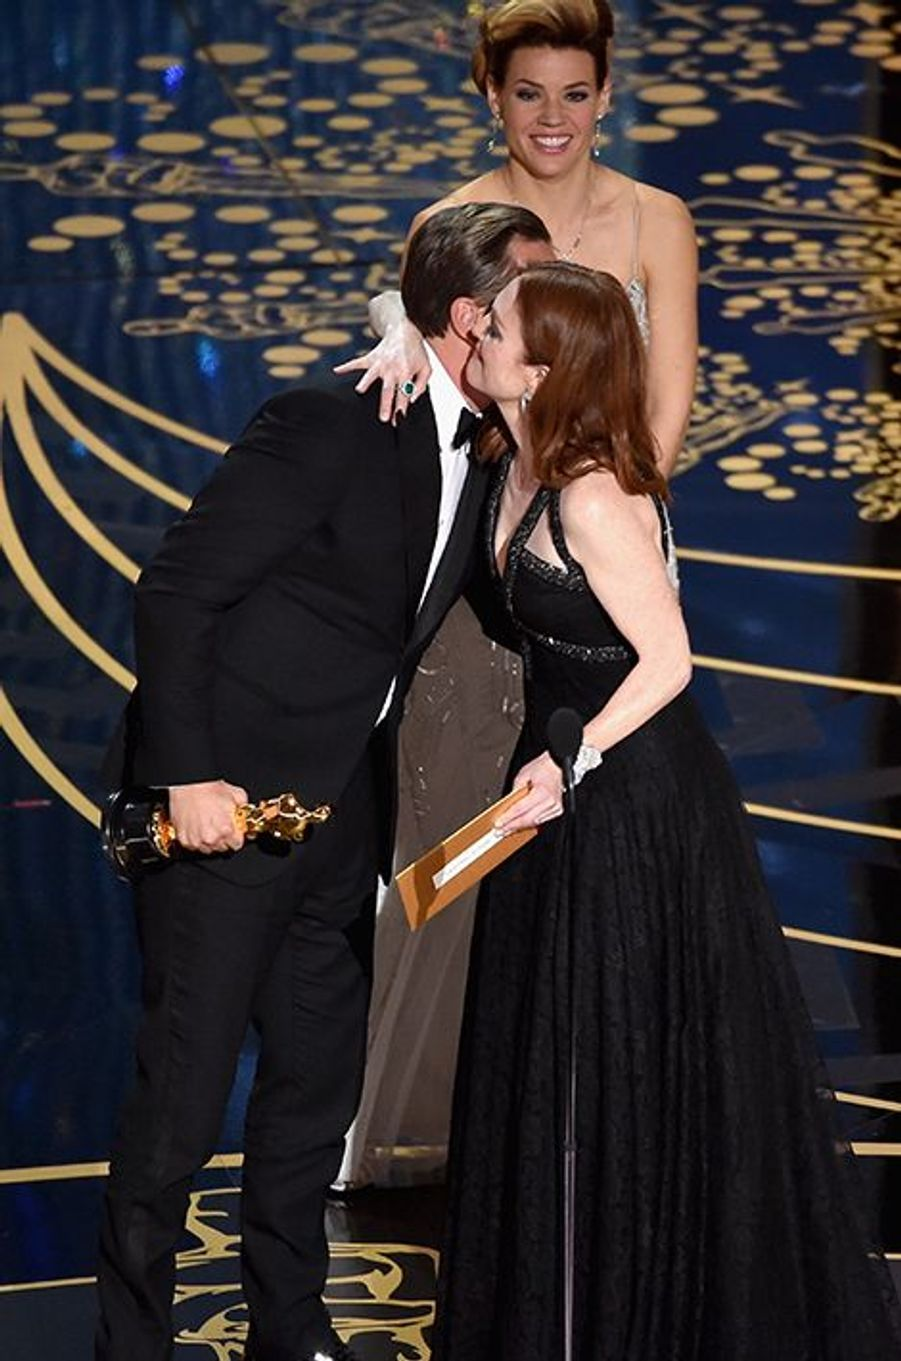 And the winner is... Leonardo DiCaprio !